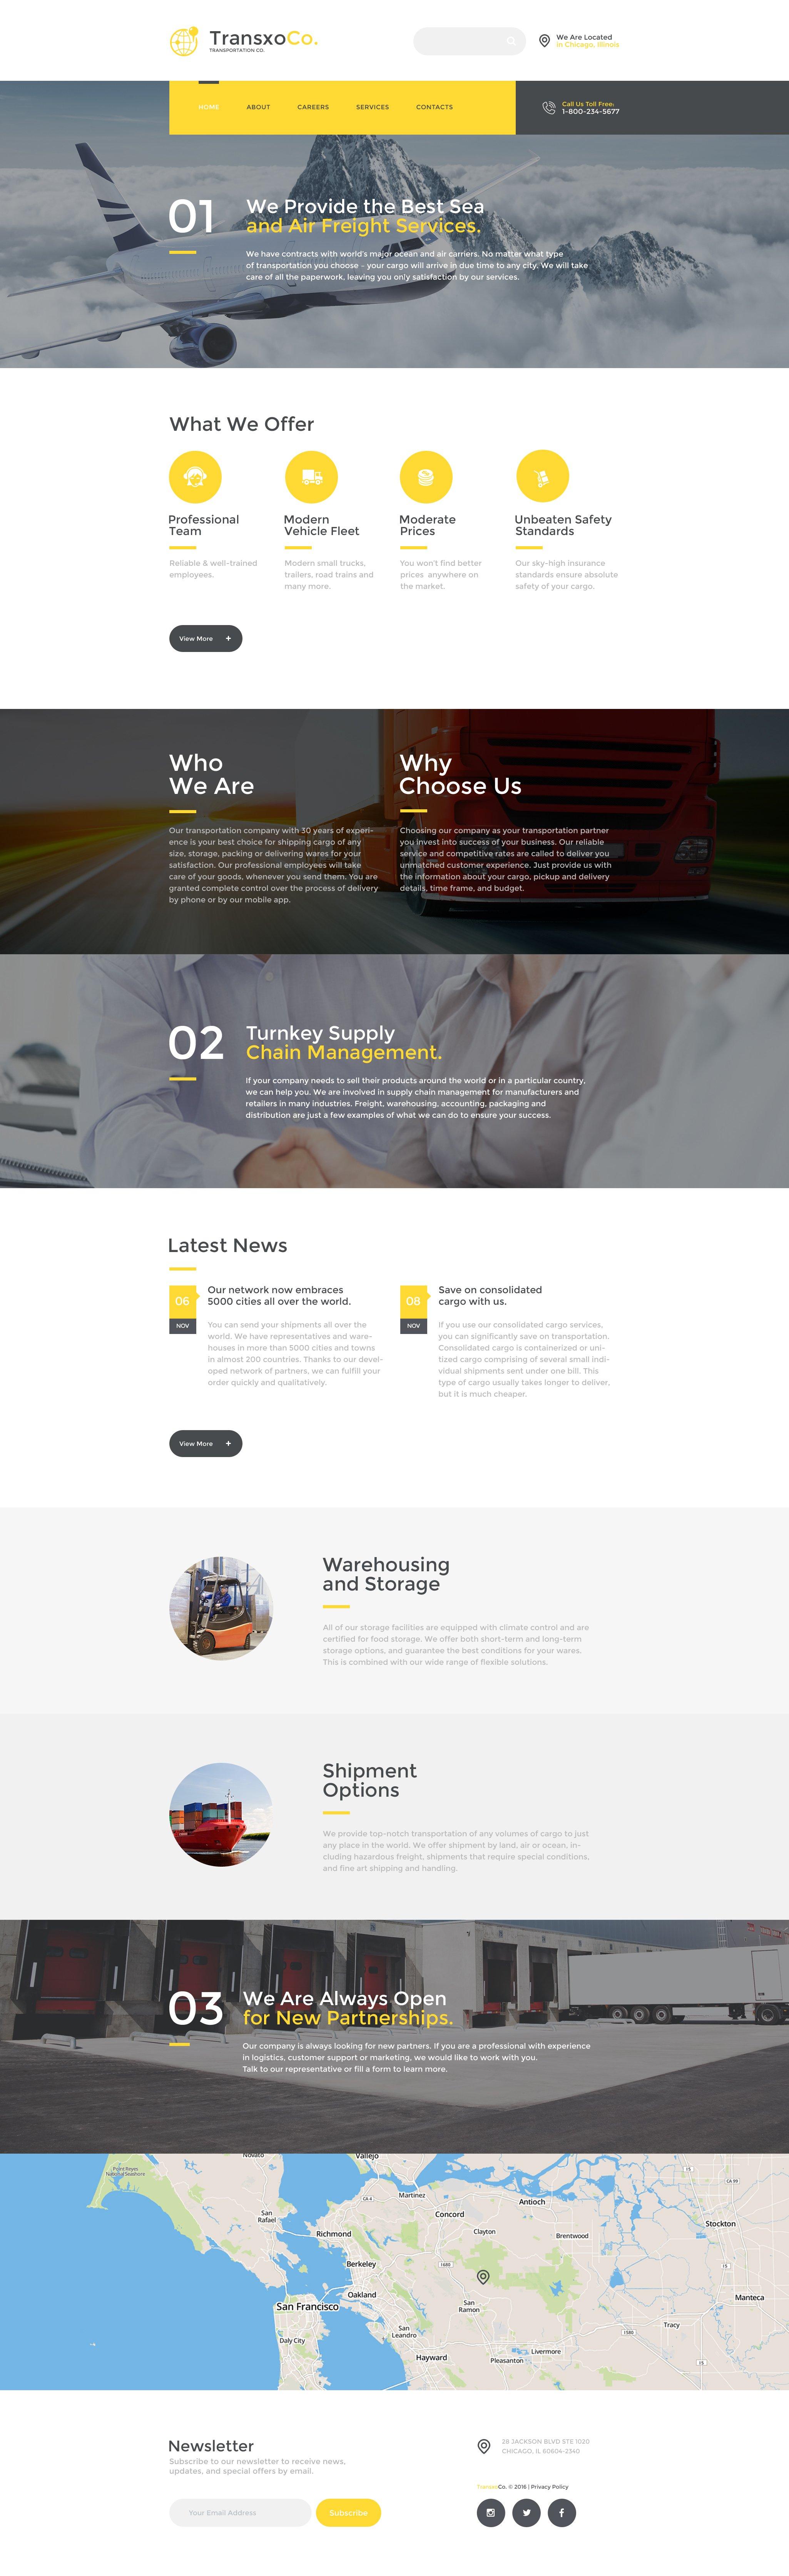 TransxoCo. Website Template - screenshot